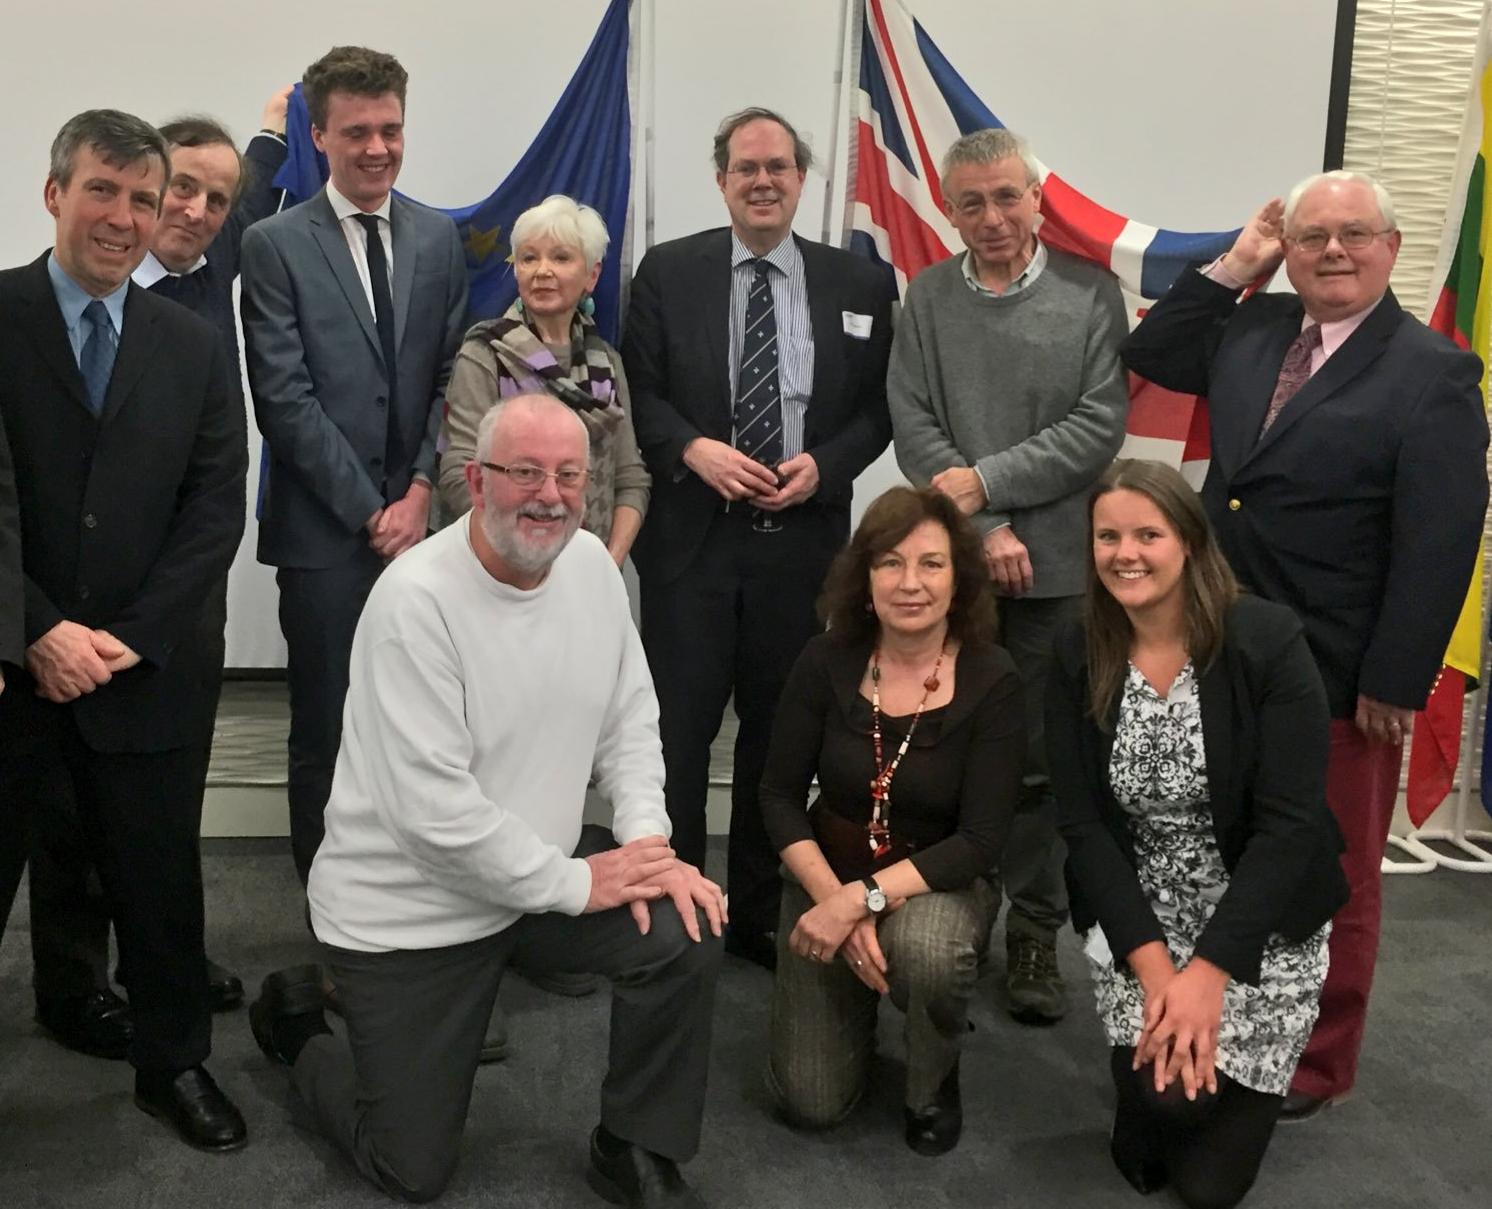 London4Europe Committee 2017